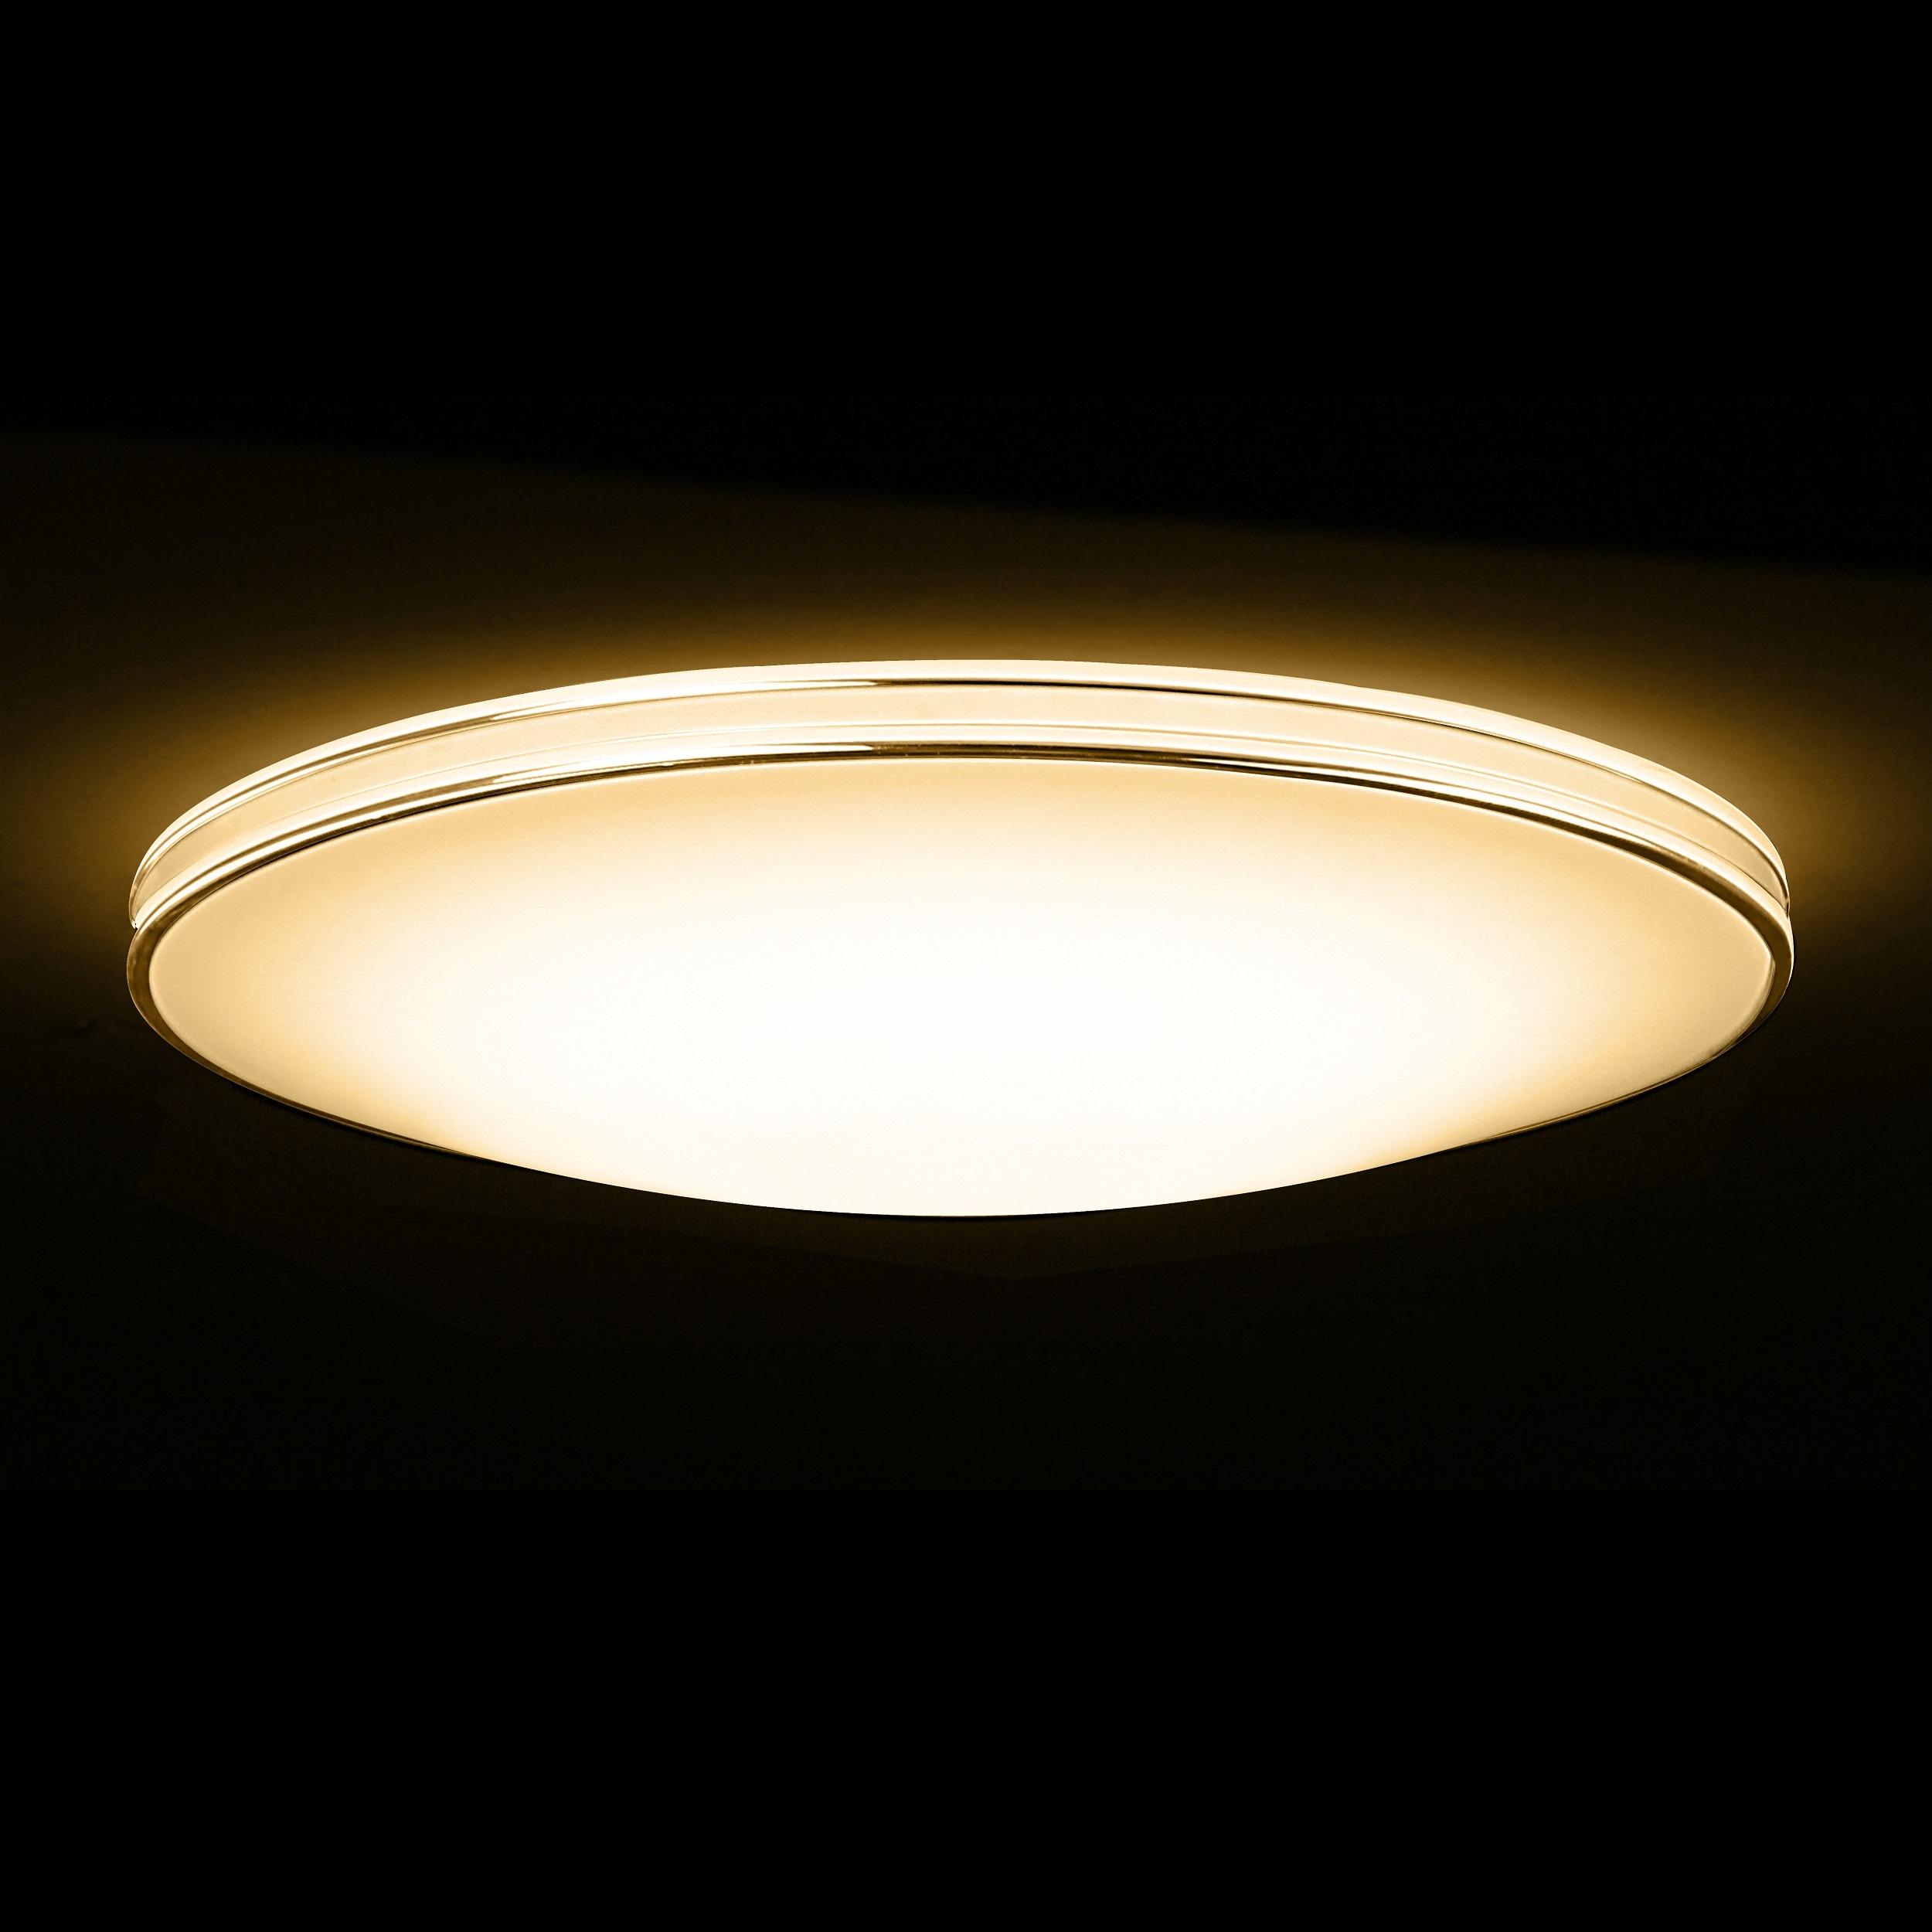 Dalen Dl C102t Intelligent Eco Led Ceiling Light L Brilliant Source Lighting